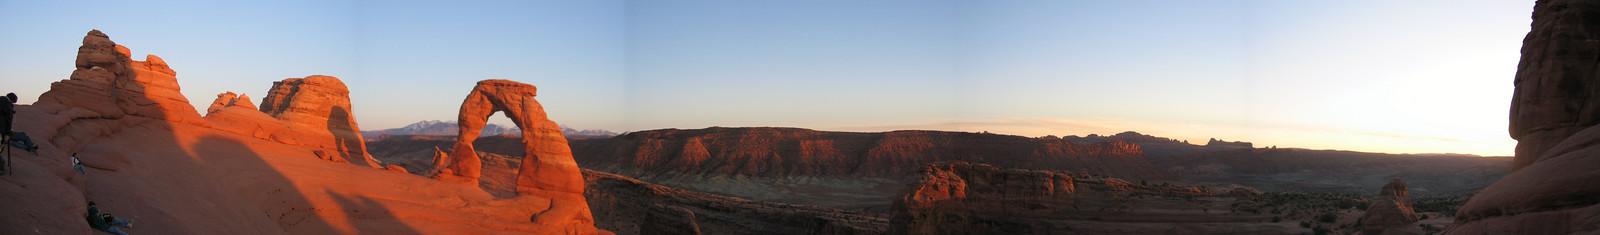 3-28-04 Moab